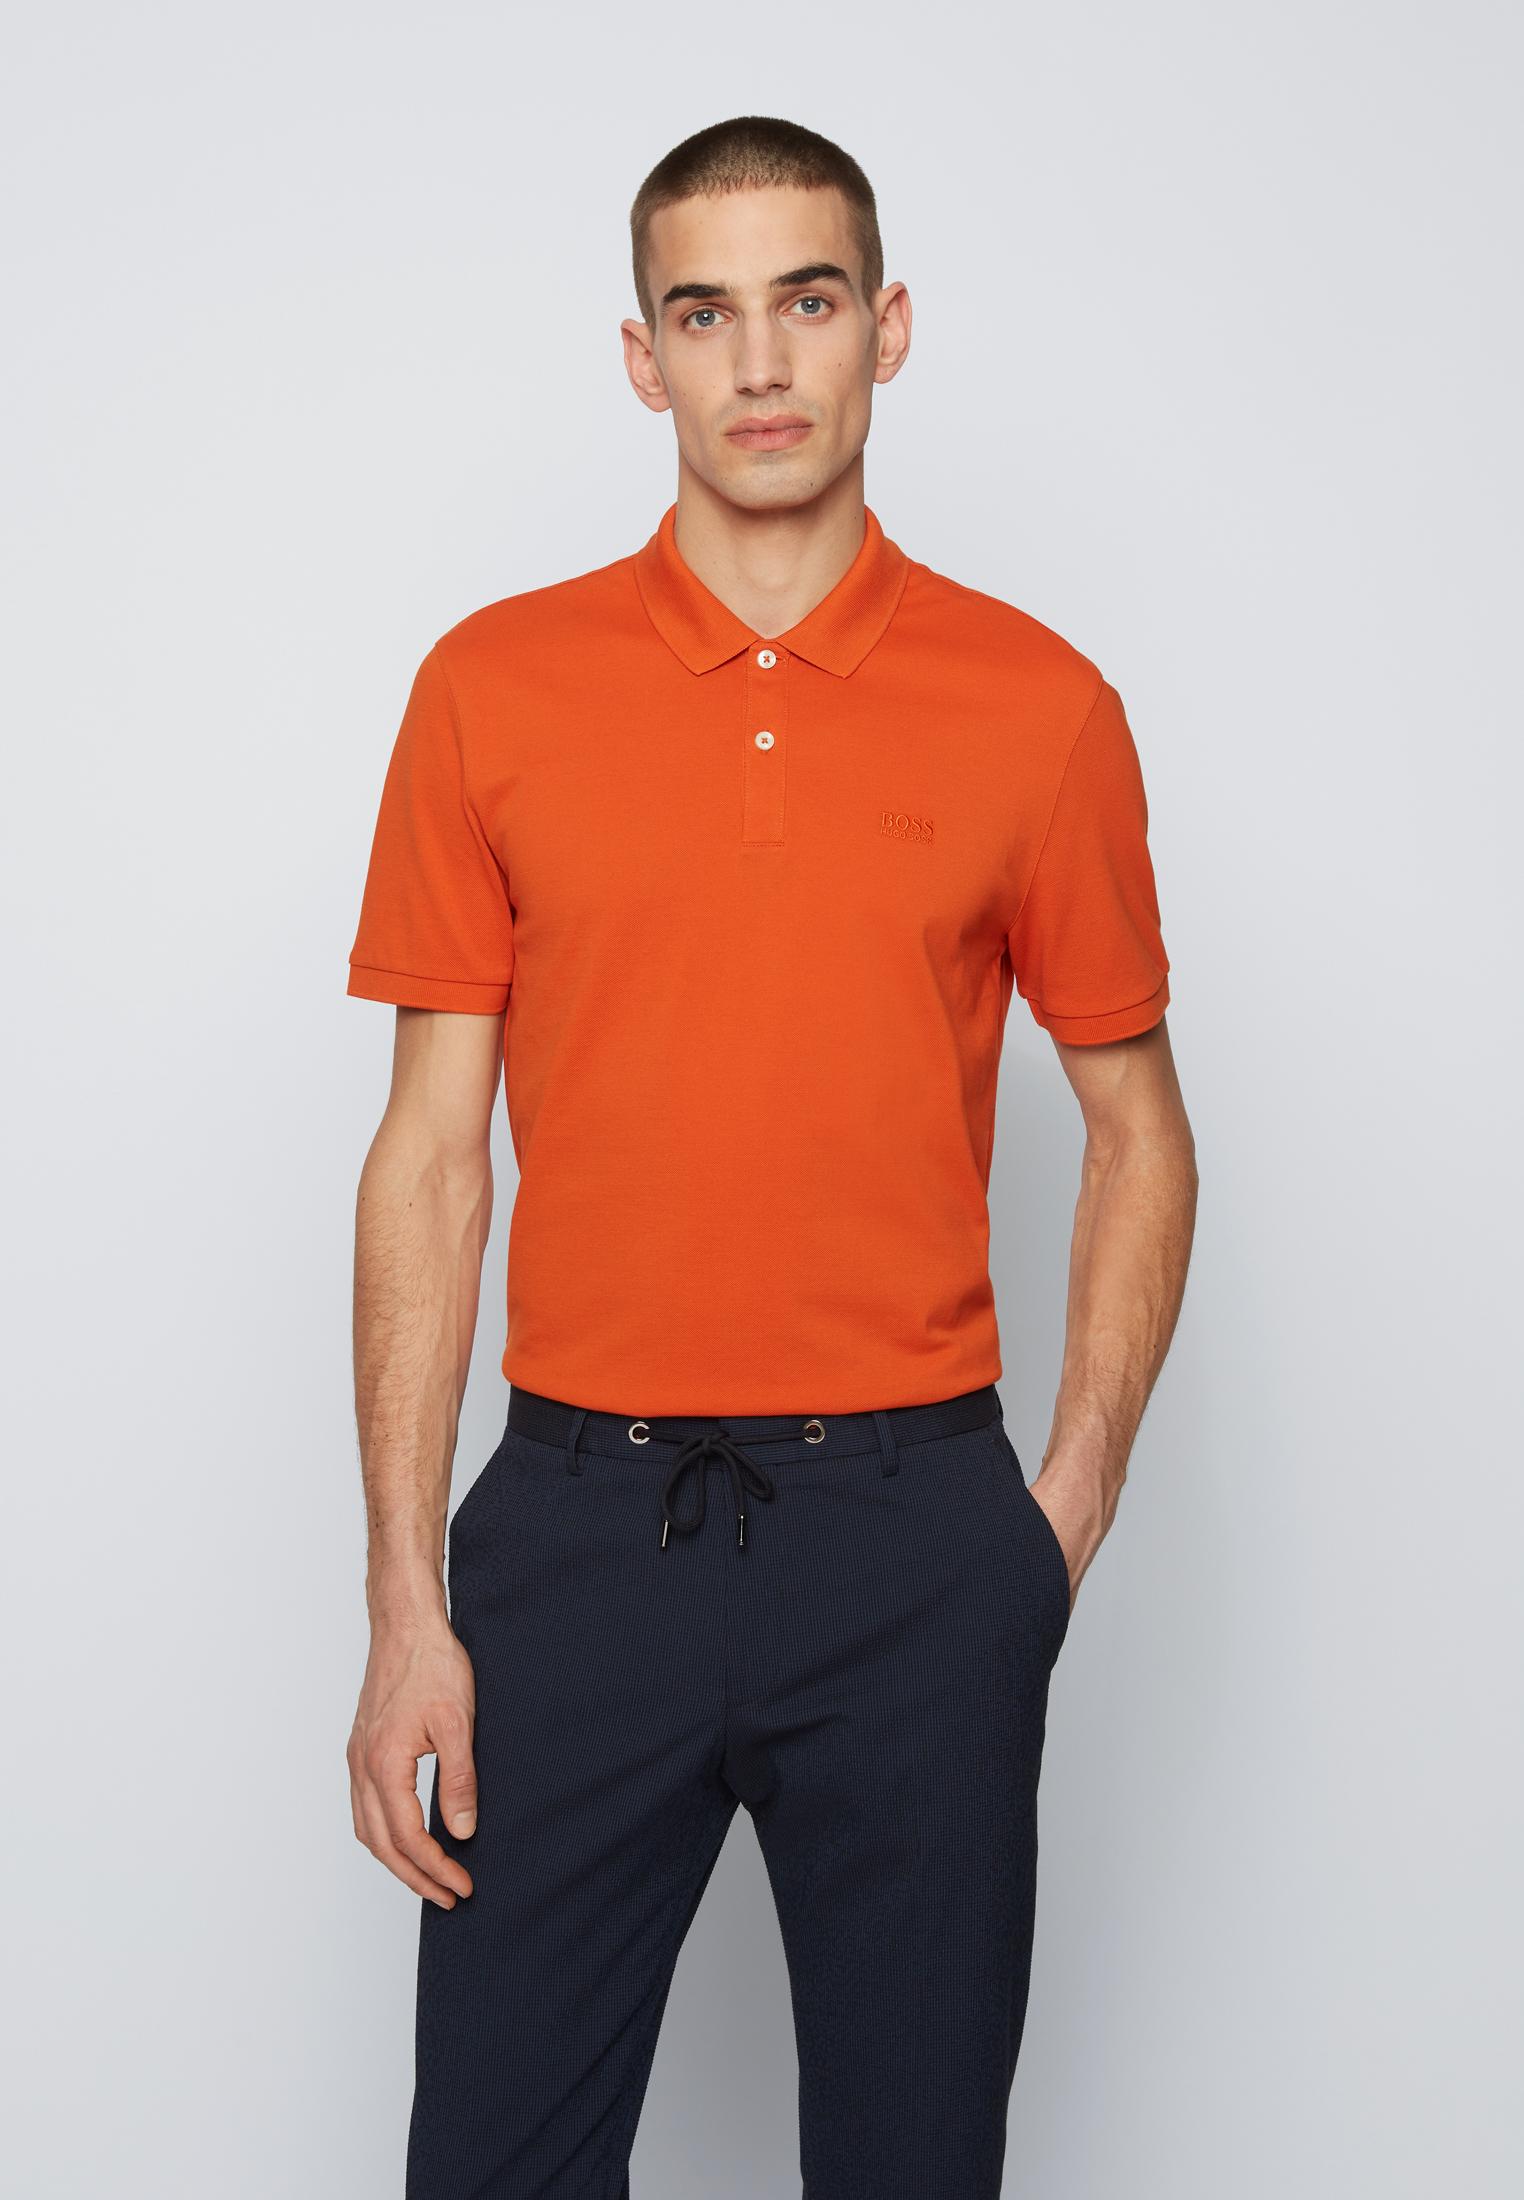 Polo regular-fit two-button - Orange BOSS | Polo Shirt | 50425985825